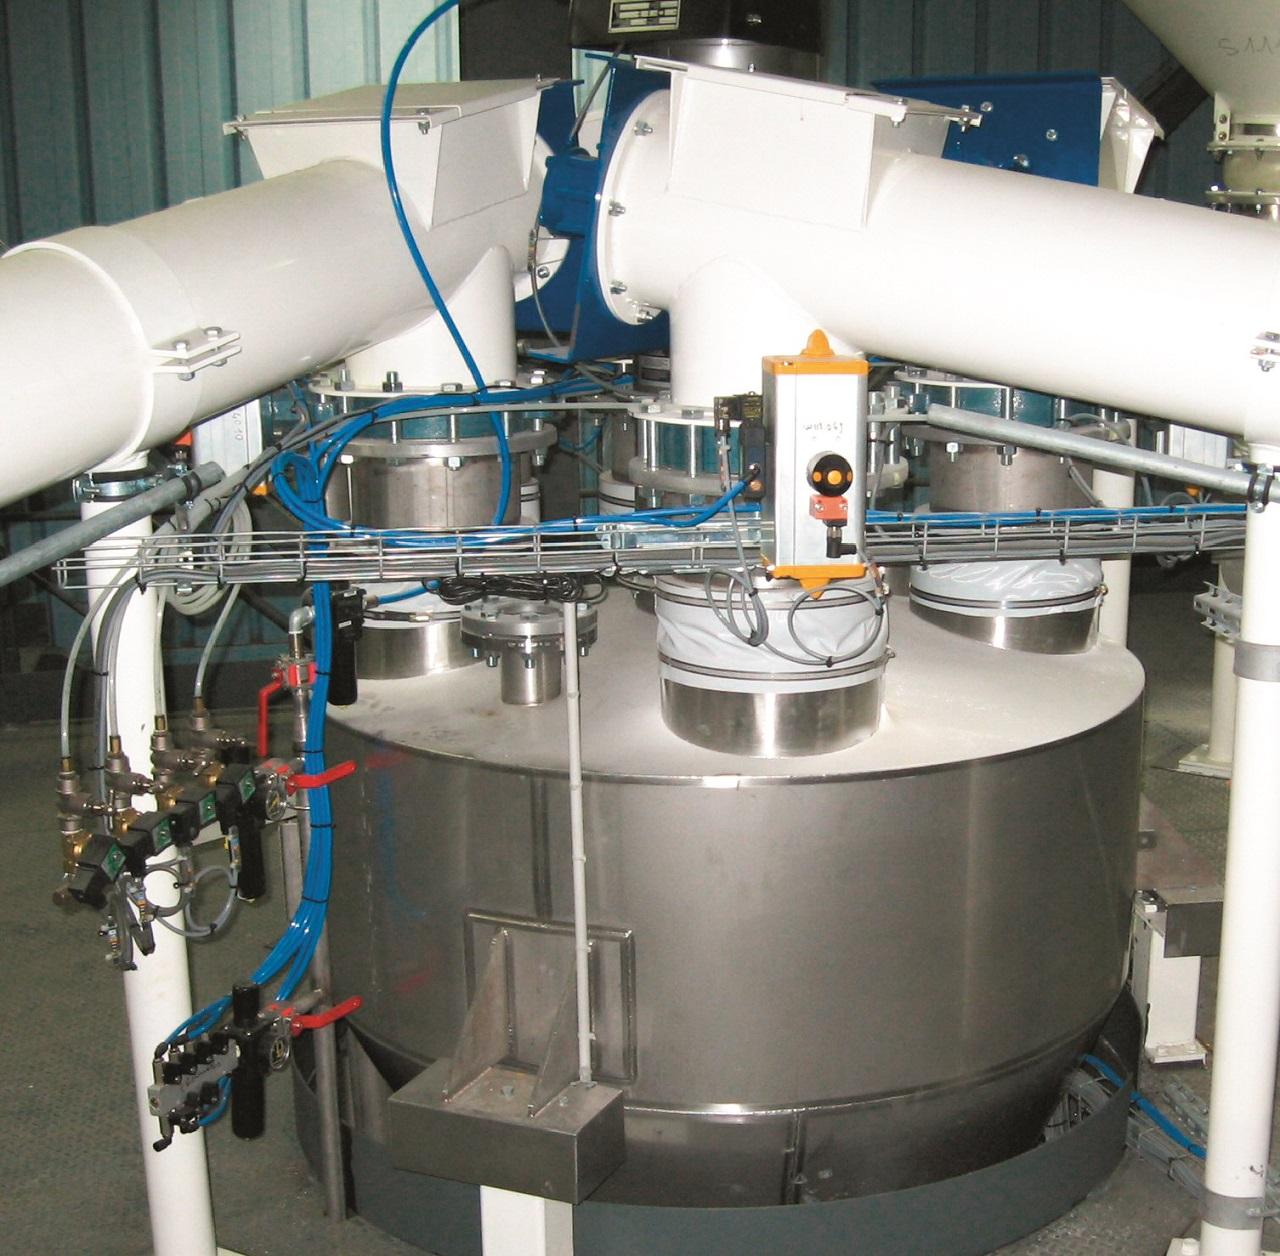 04 A typical batch reactor.